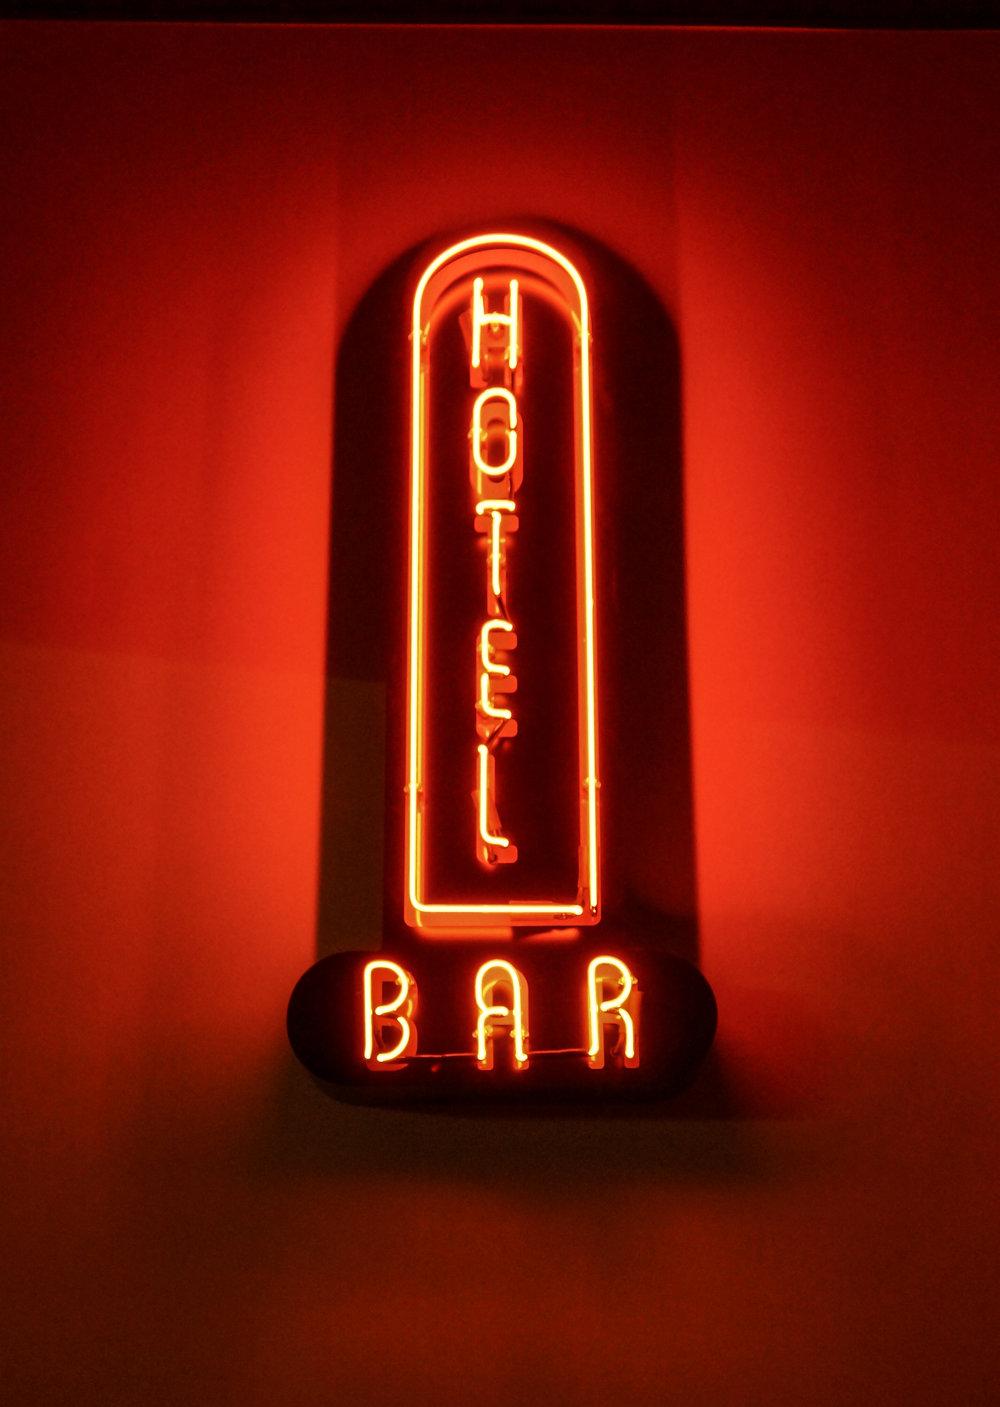 Hote Bar Sign